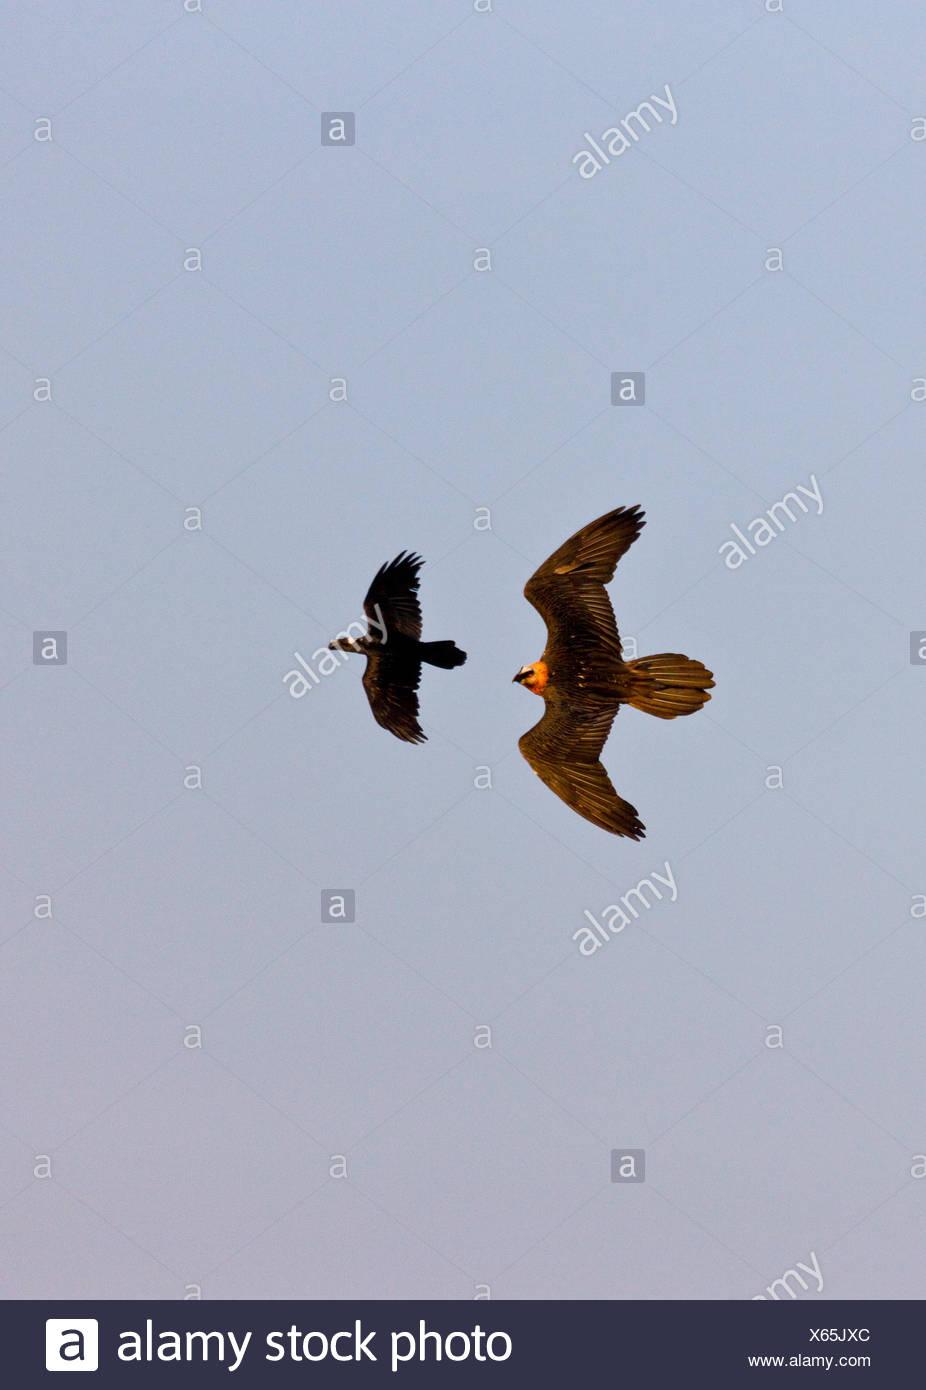 Lammergeier / Bearded Vulture (Gypaetus barbatus) chasing Thick-billed Raven (Corvus crassirostris) in flight. Simien National Park, Ethiopia, Africa. - Stock Image